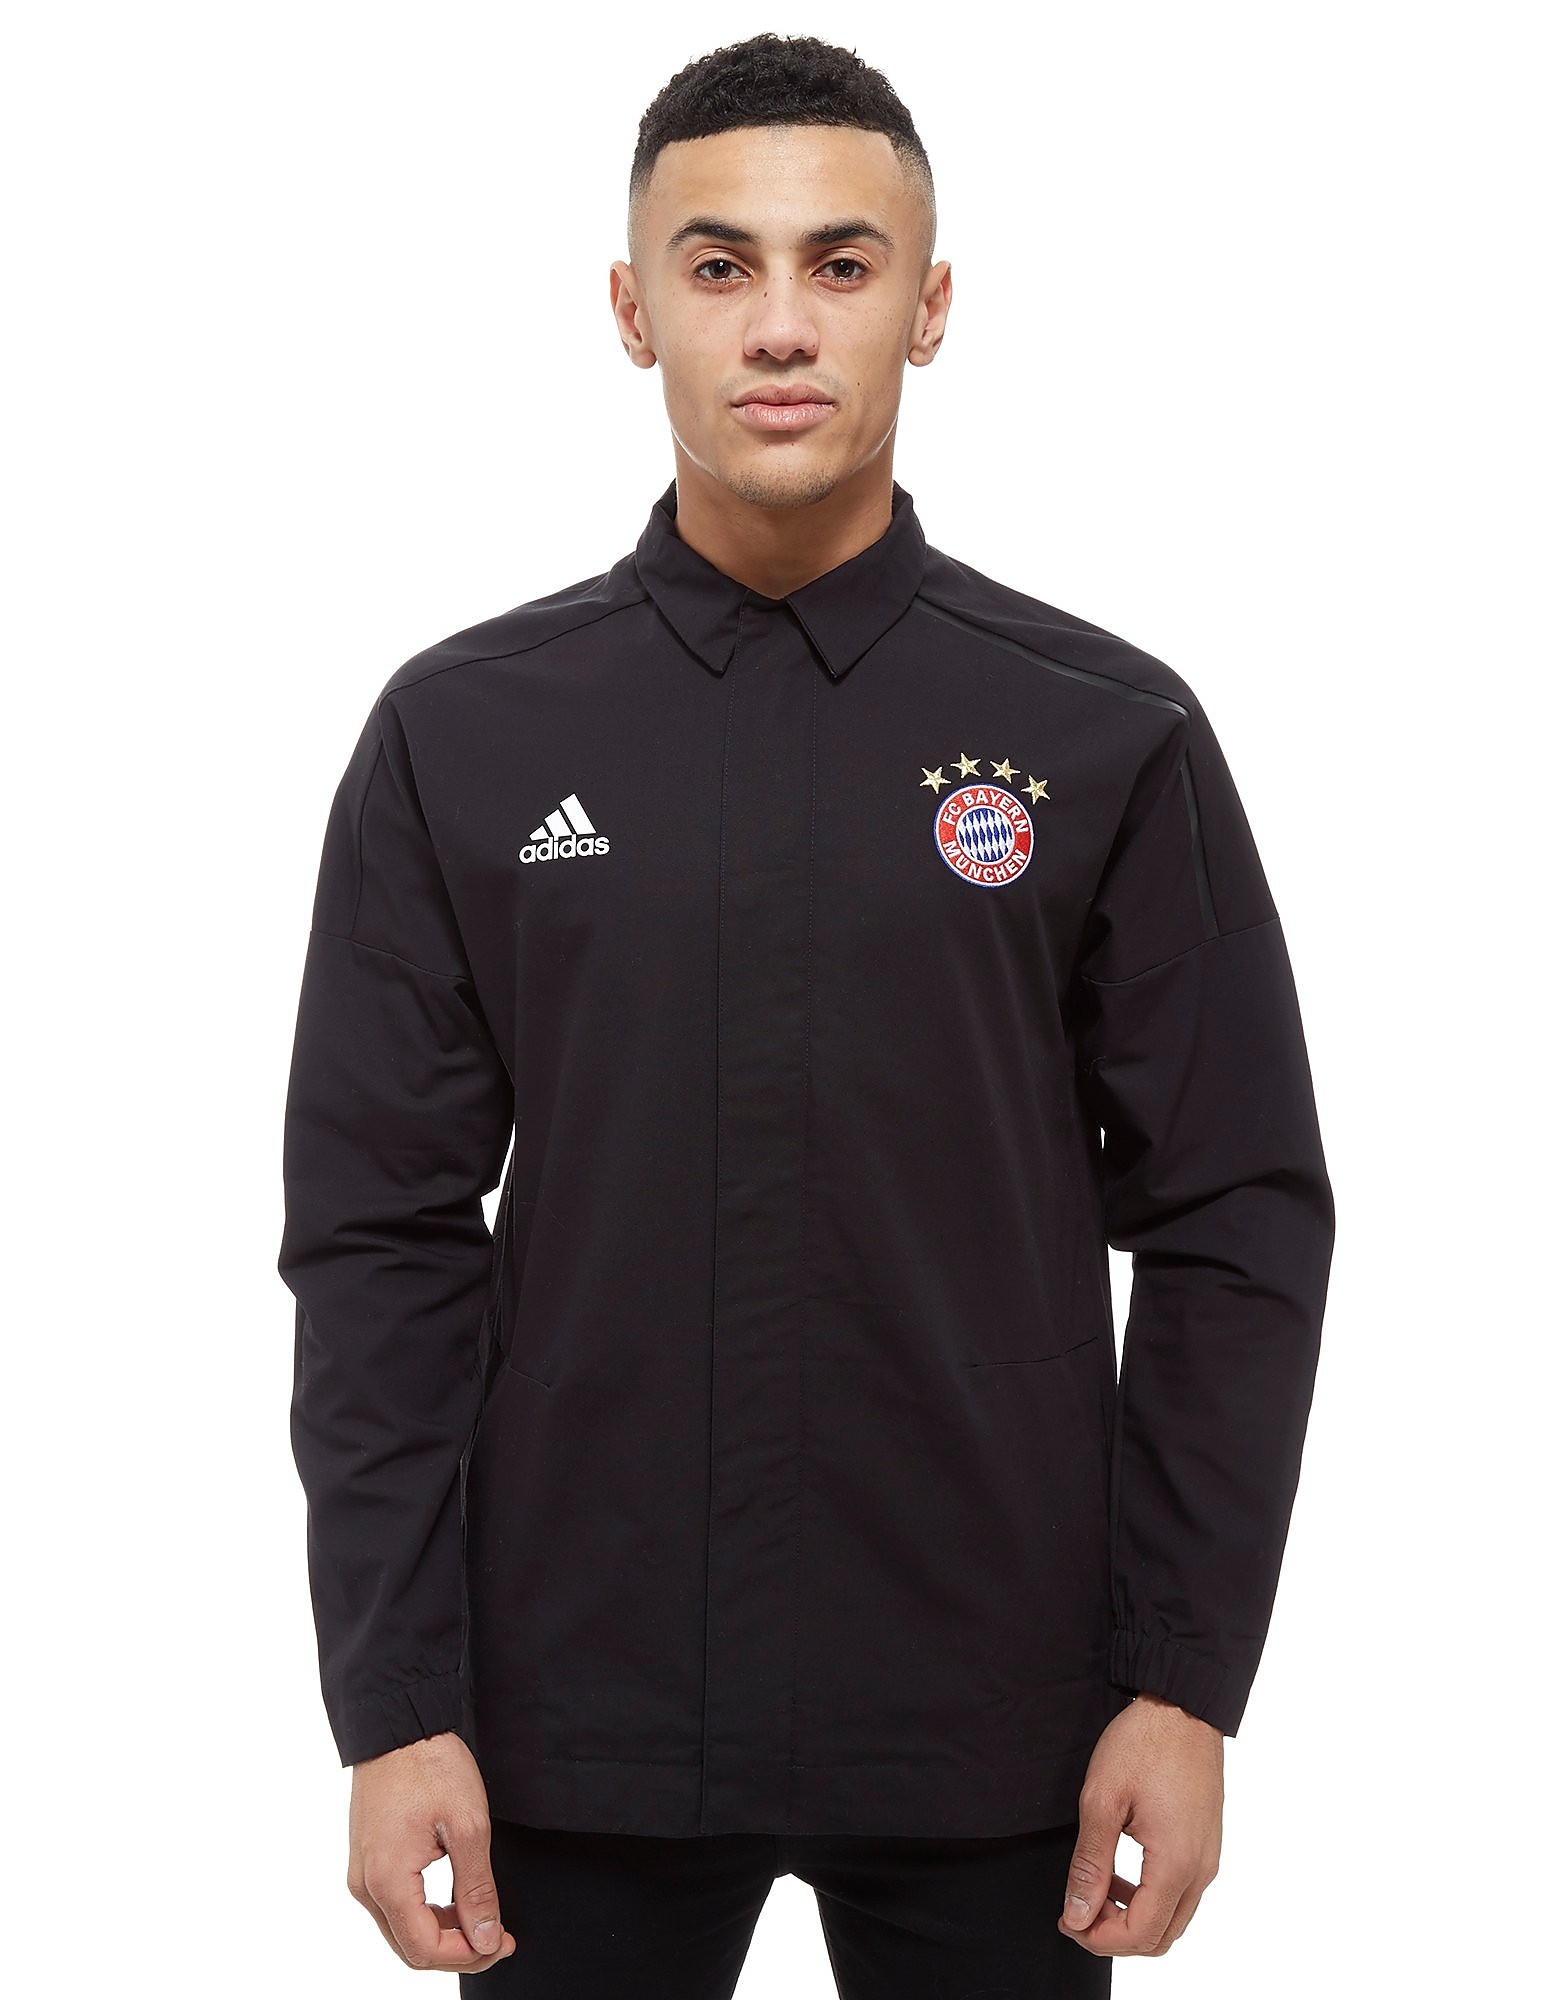 adidas FC Bayern Munich 2018 Z.N.E Jacket